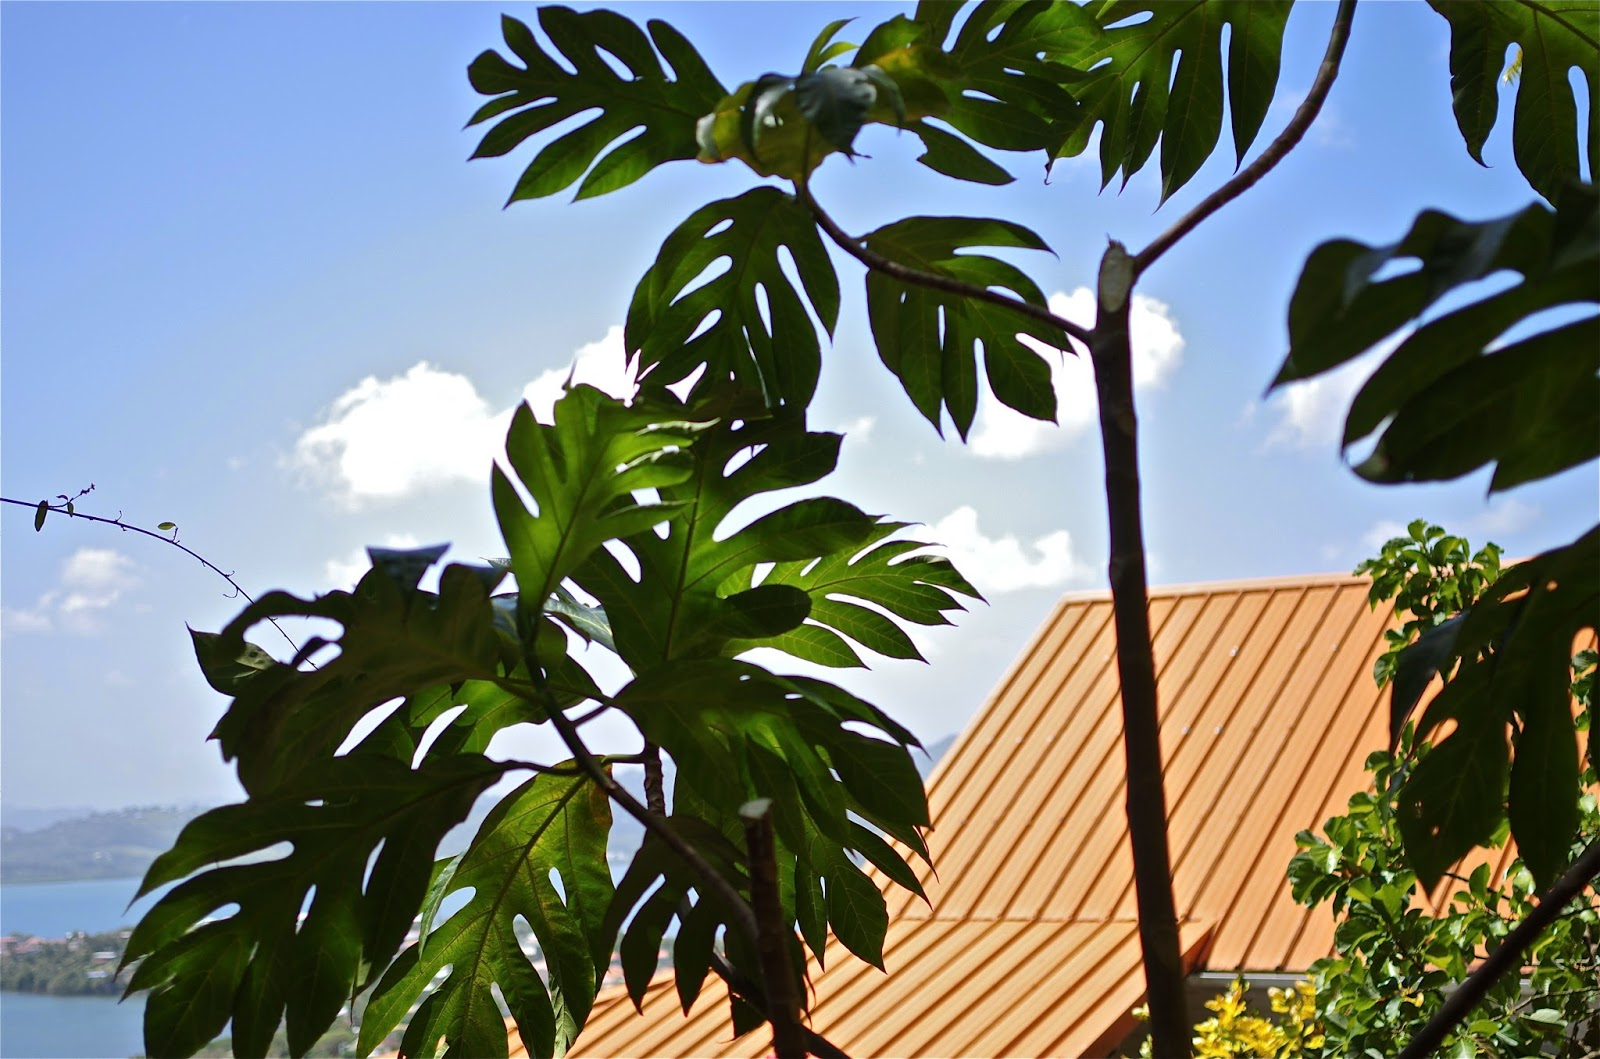 Persil et oignon pays ortanique - Quand repiquer le persil ...